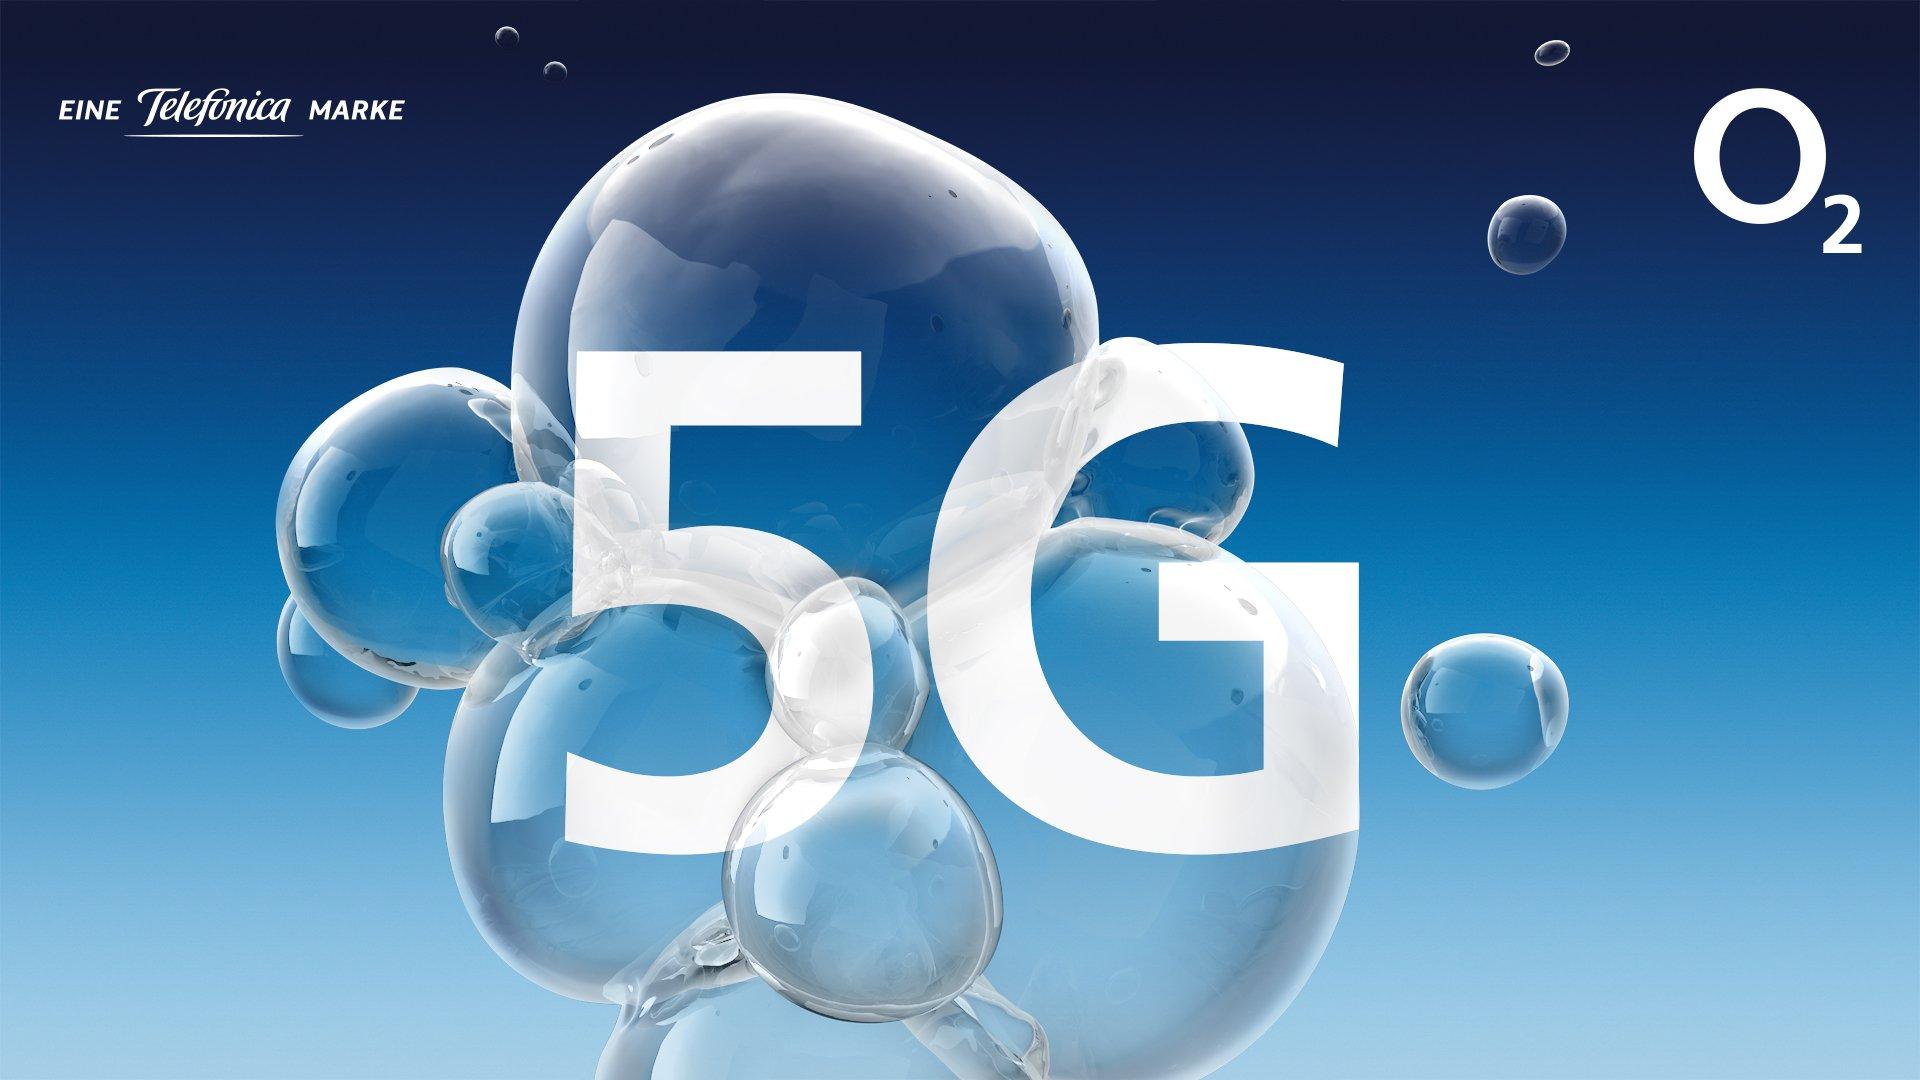 o2-5G-Logo-01-Bubble-cluster-Blauverlauf-quadrat-1920x1080